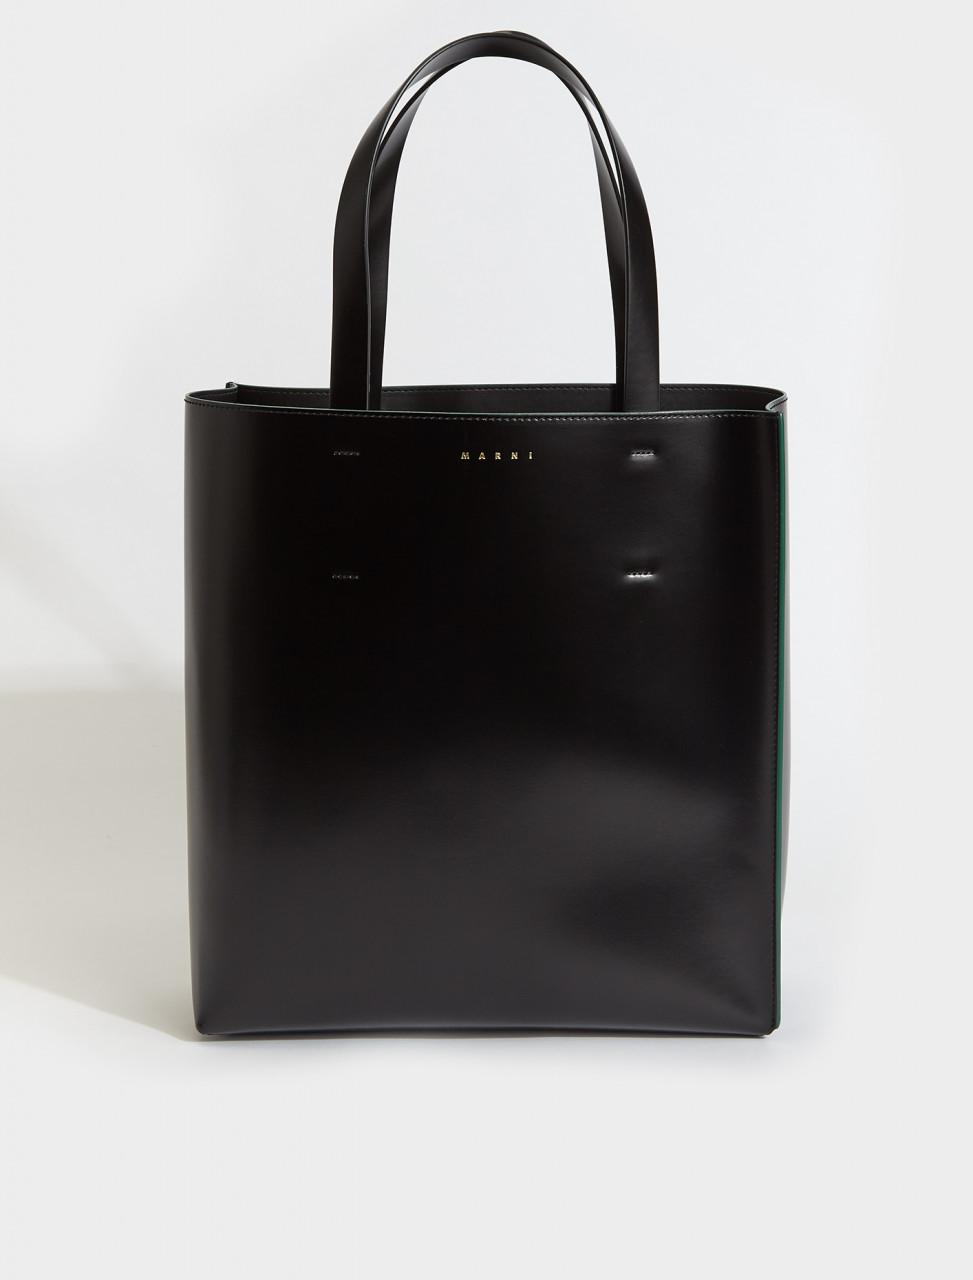 SHMPV02Y00-Z1N99 MARNI SHOPPING BAG BLACK